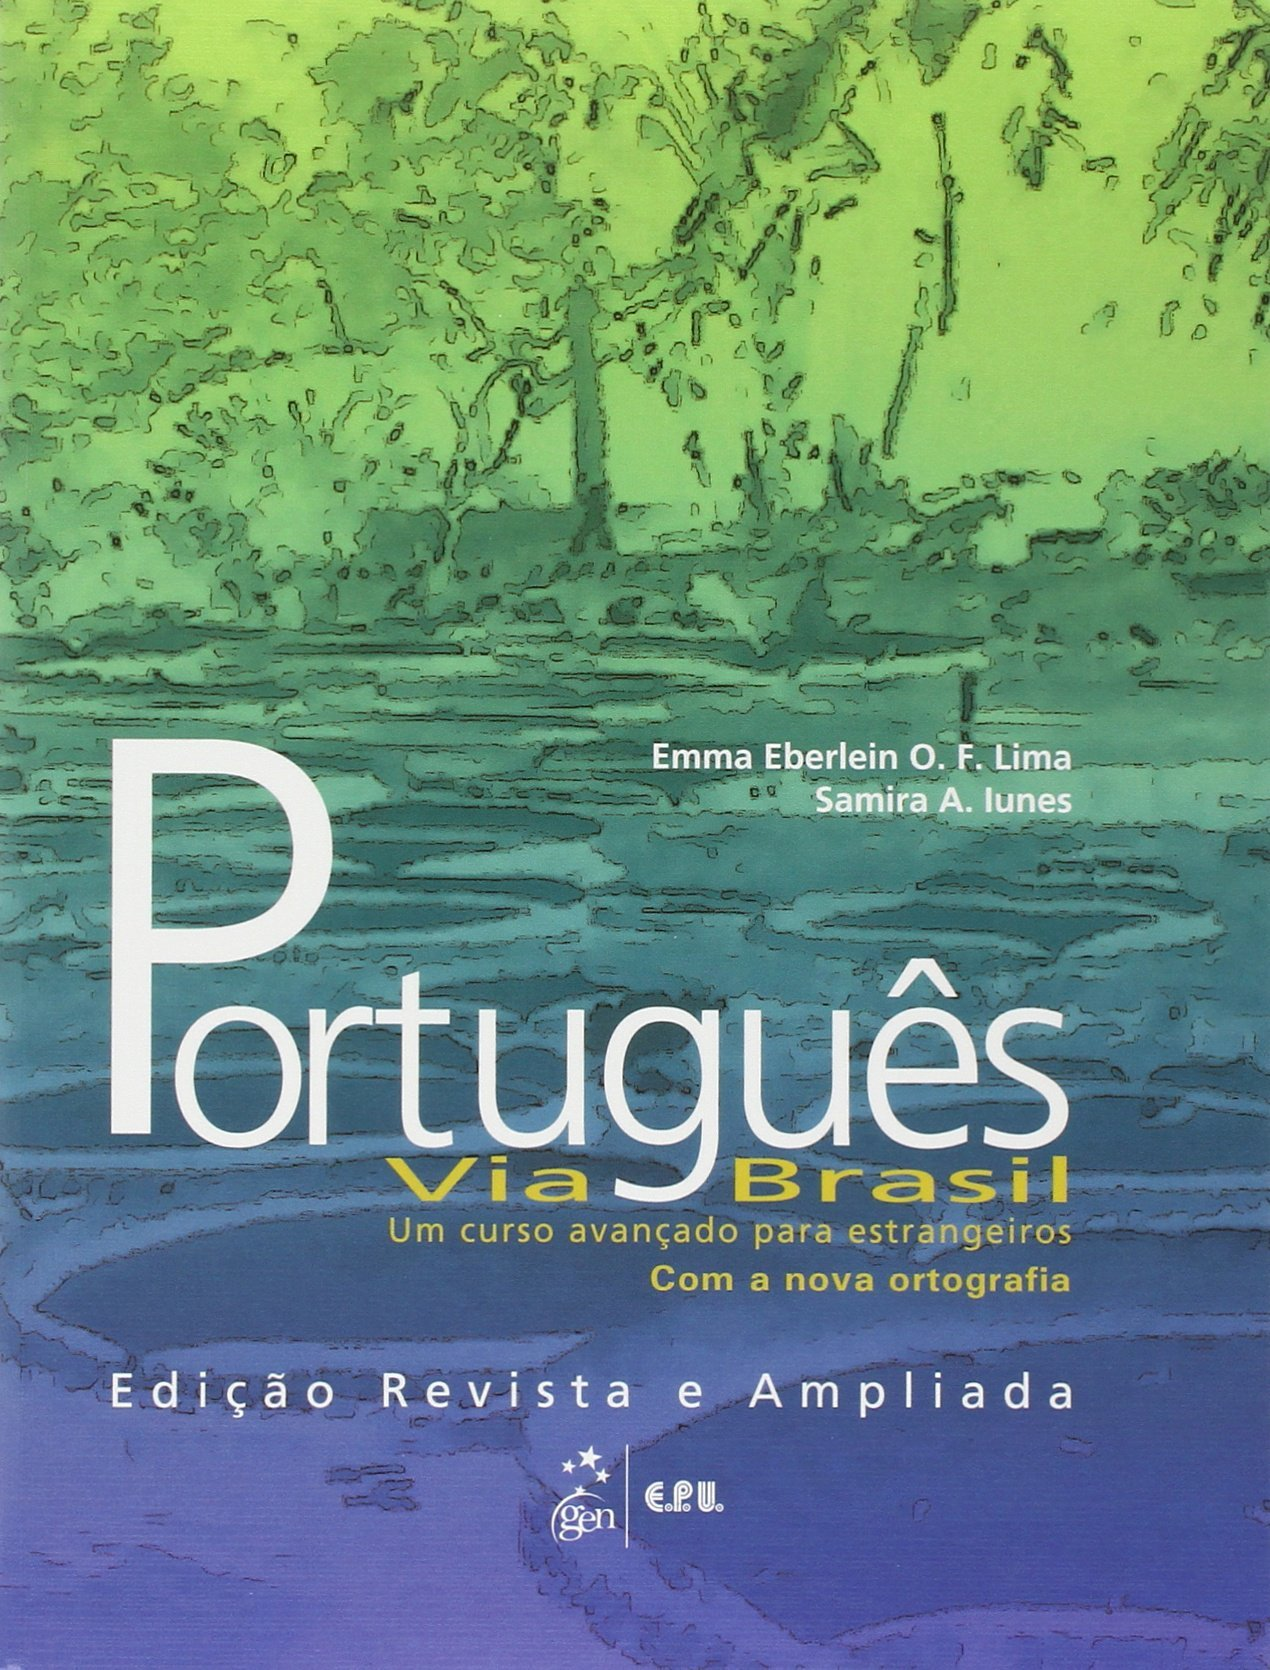 Português Via Brasil. Portugiesisch für Fortgeschrittene/Livro Texto. Neubearbeitung